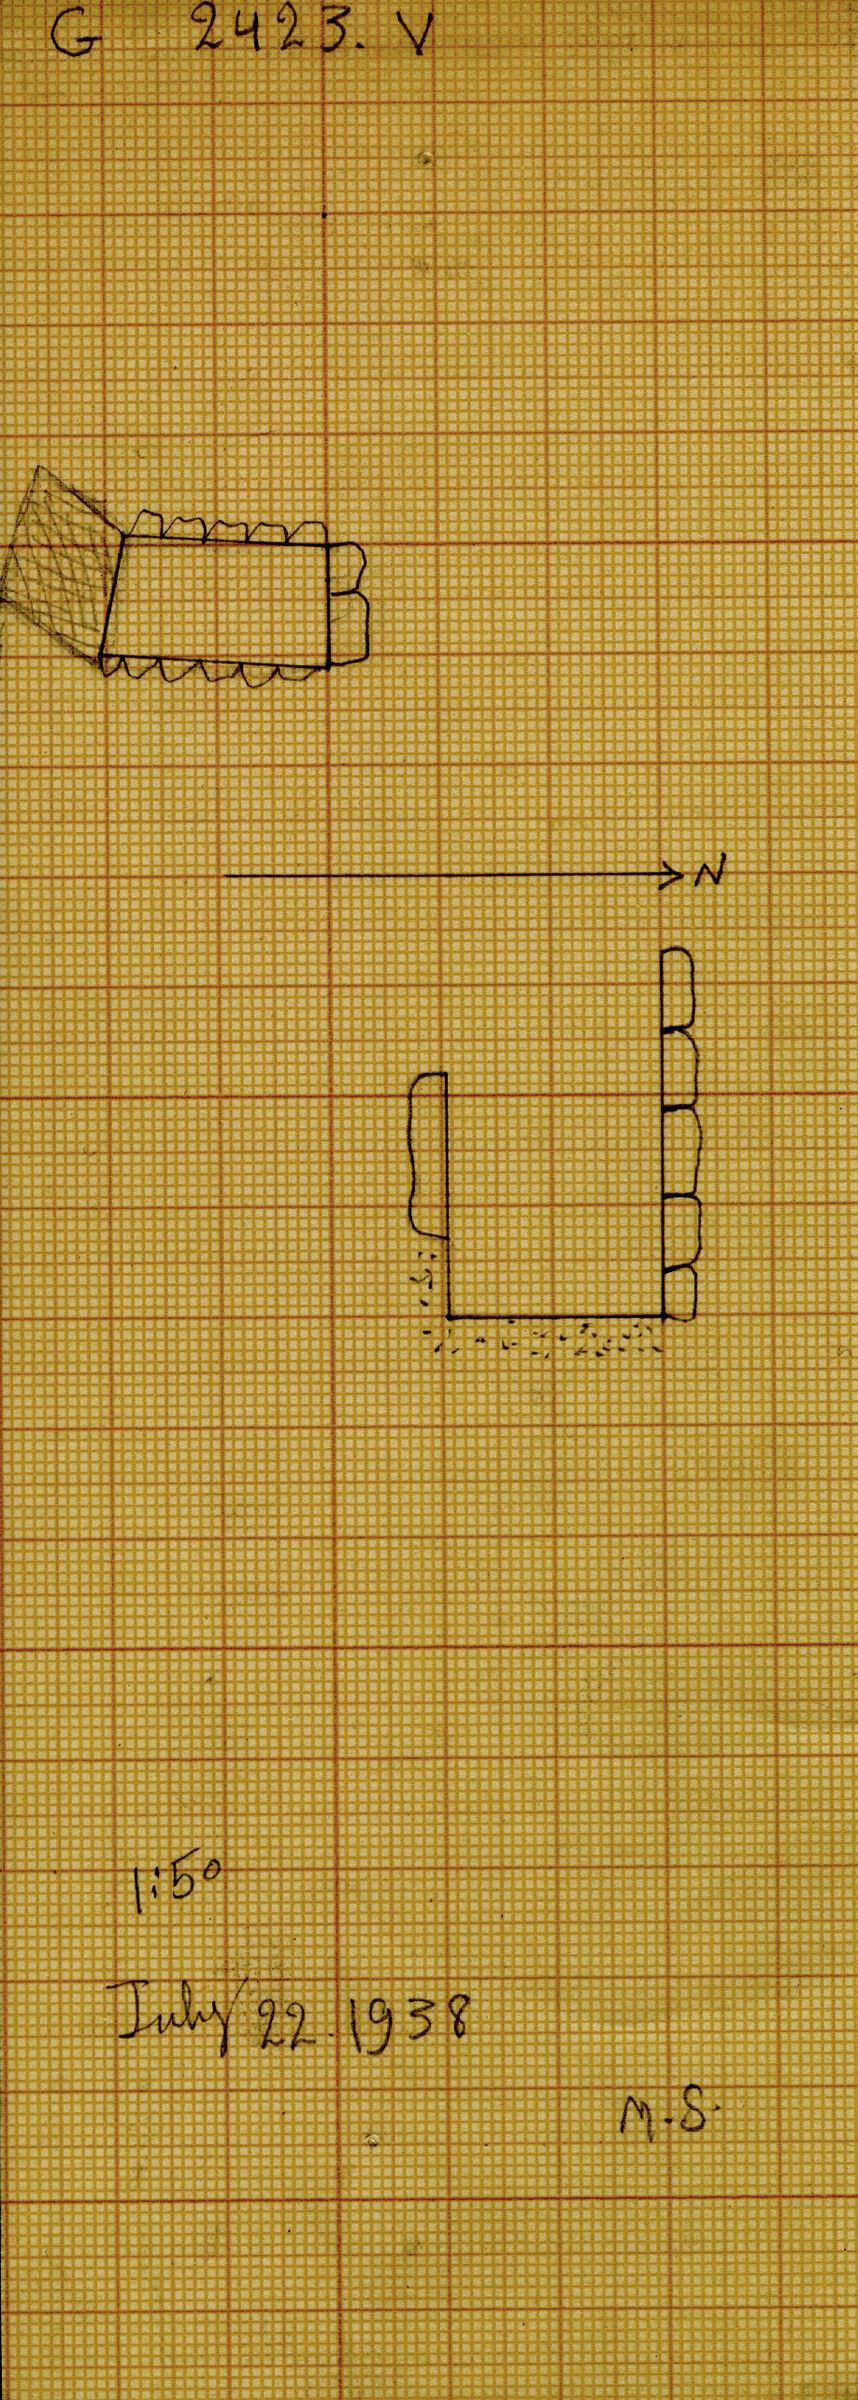 Maps and plans: G 2423, Shaft V